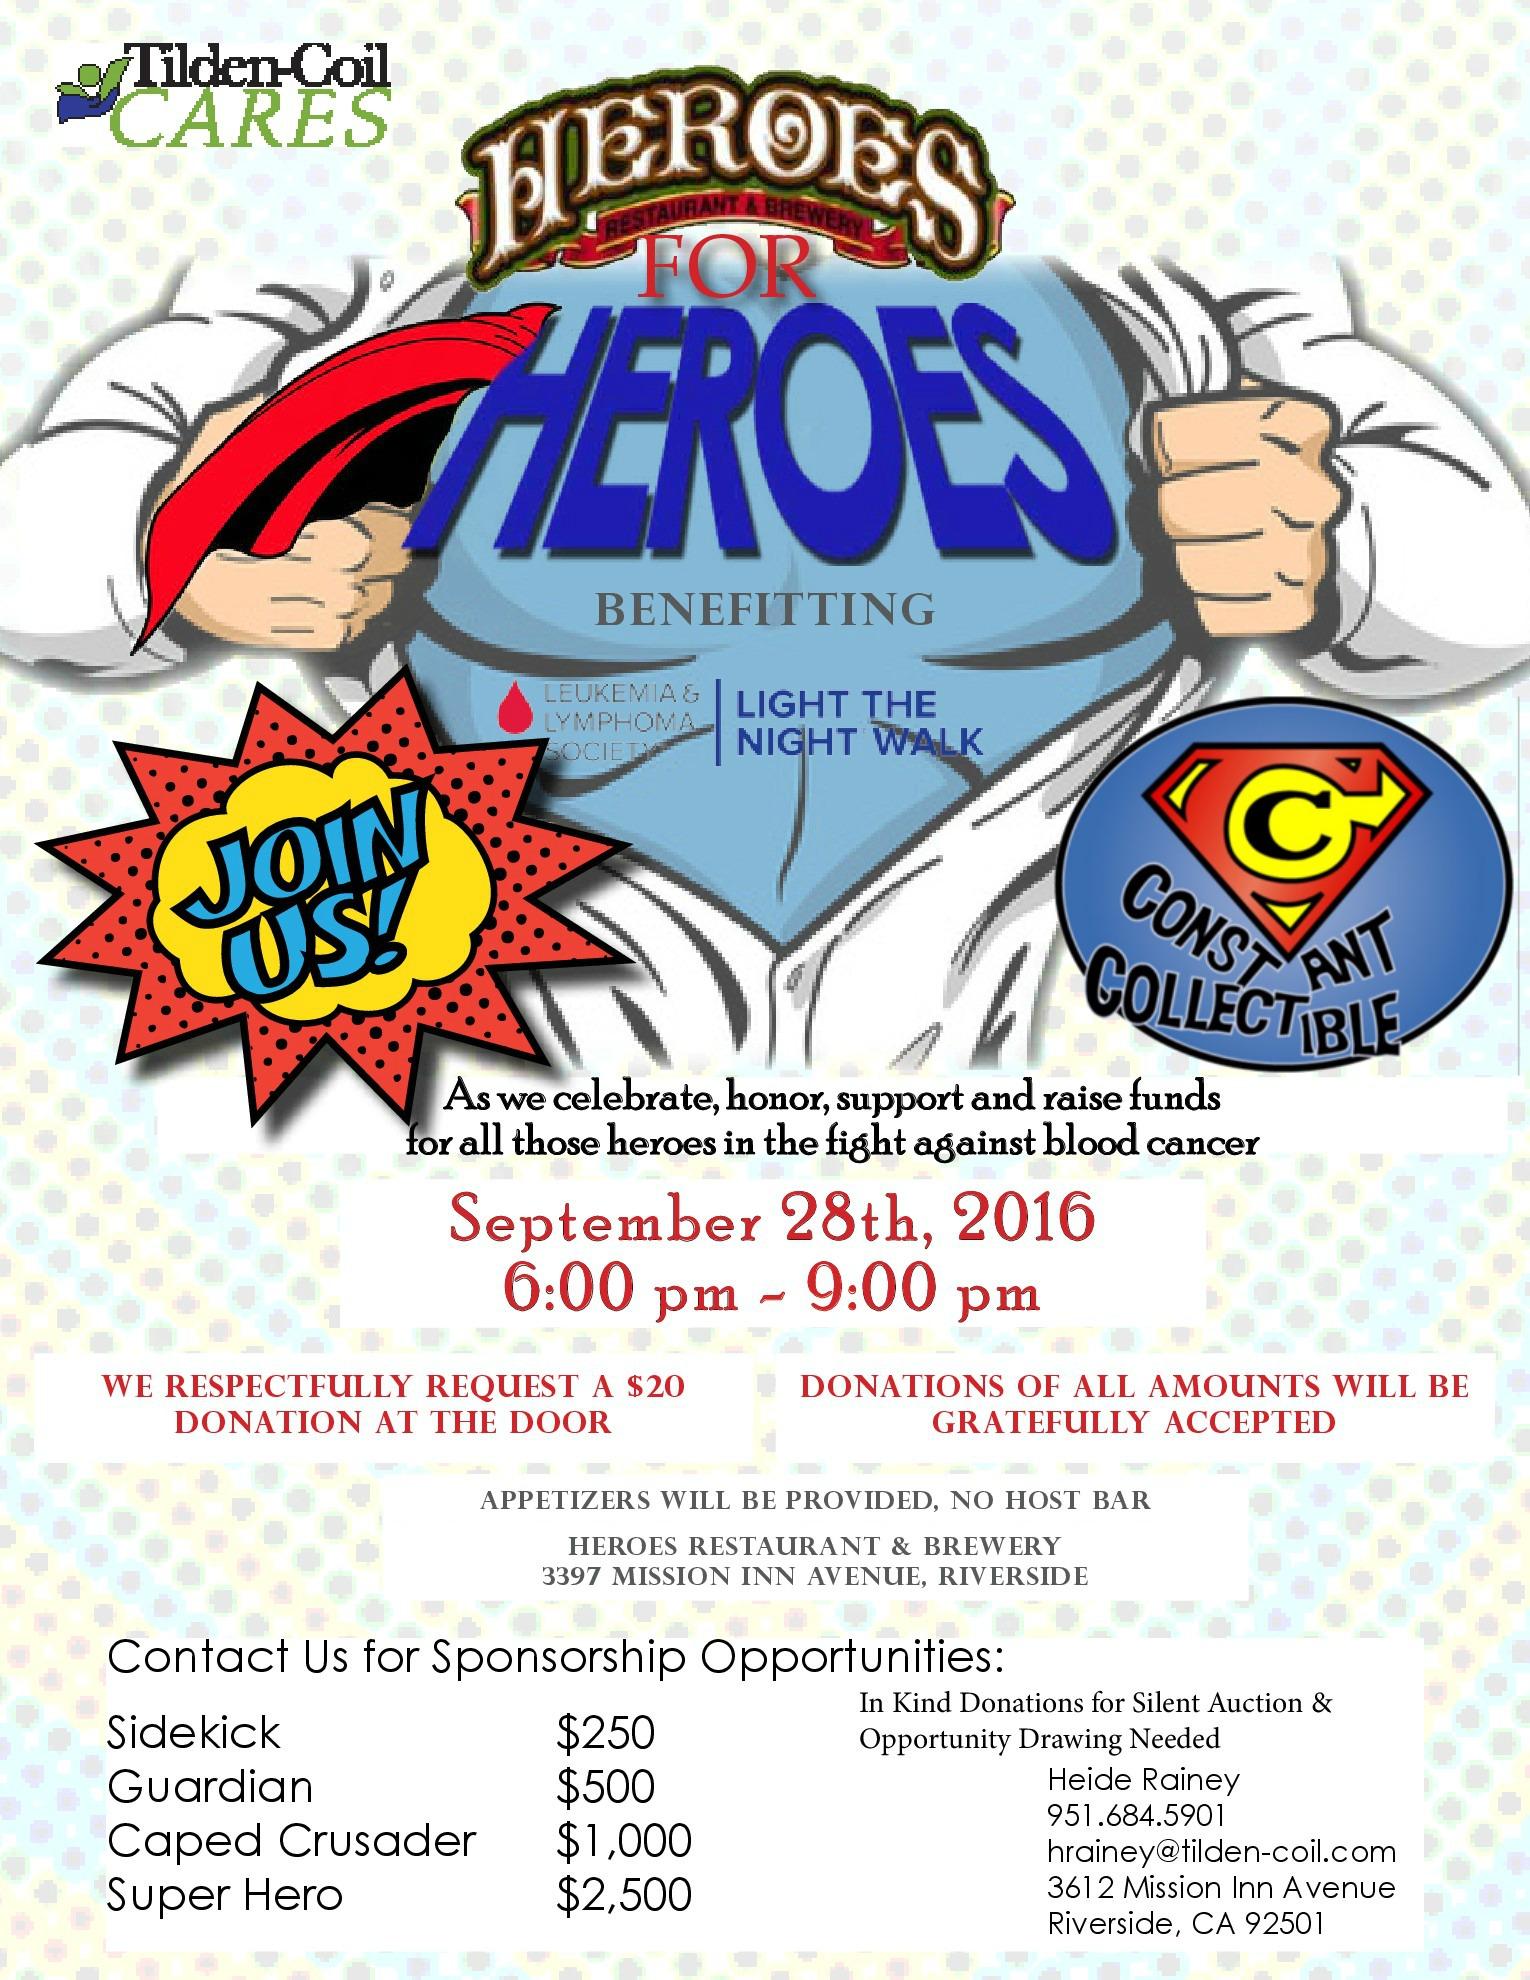 cc-heros-cancer